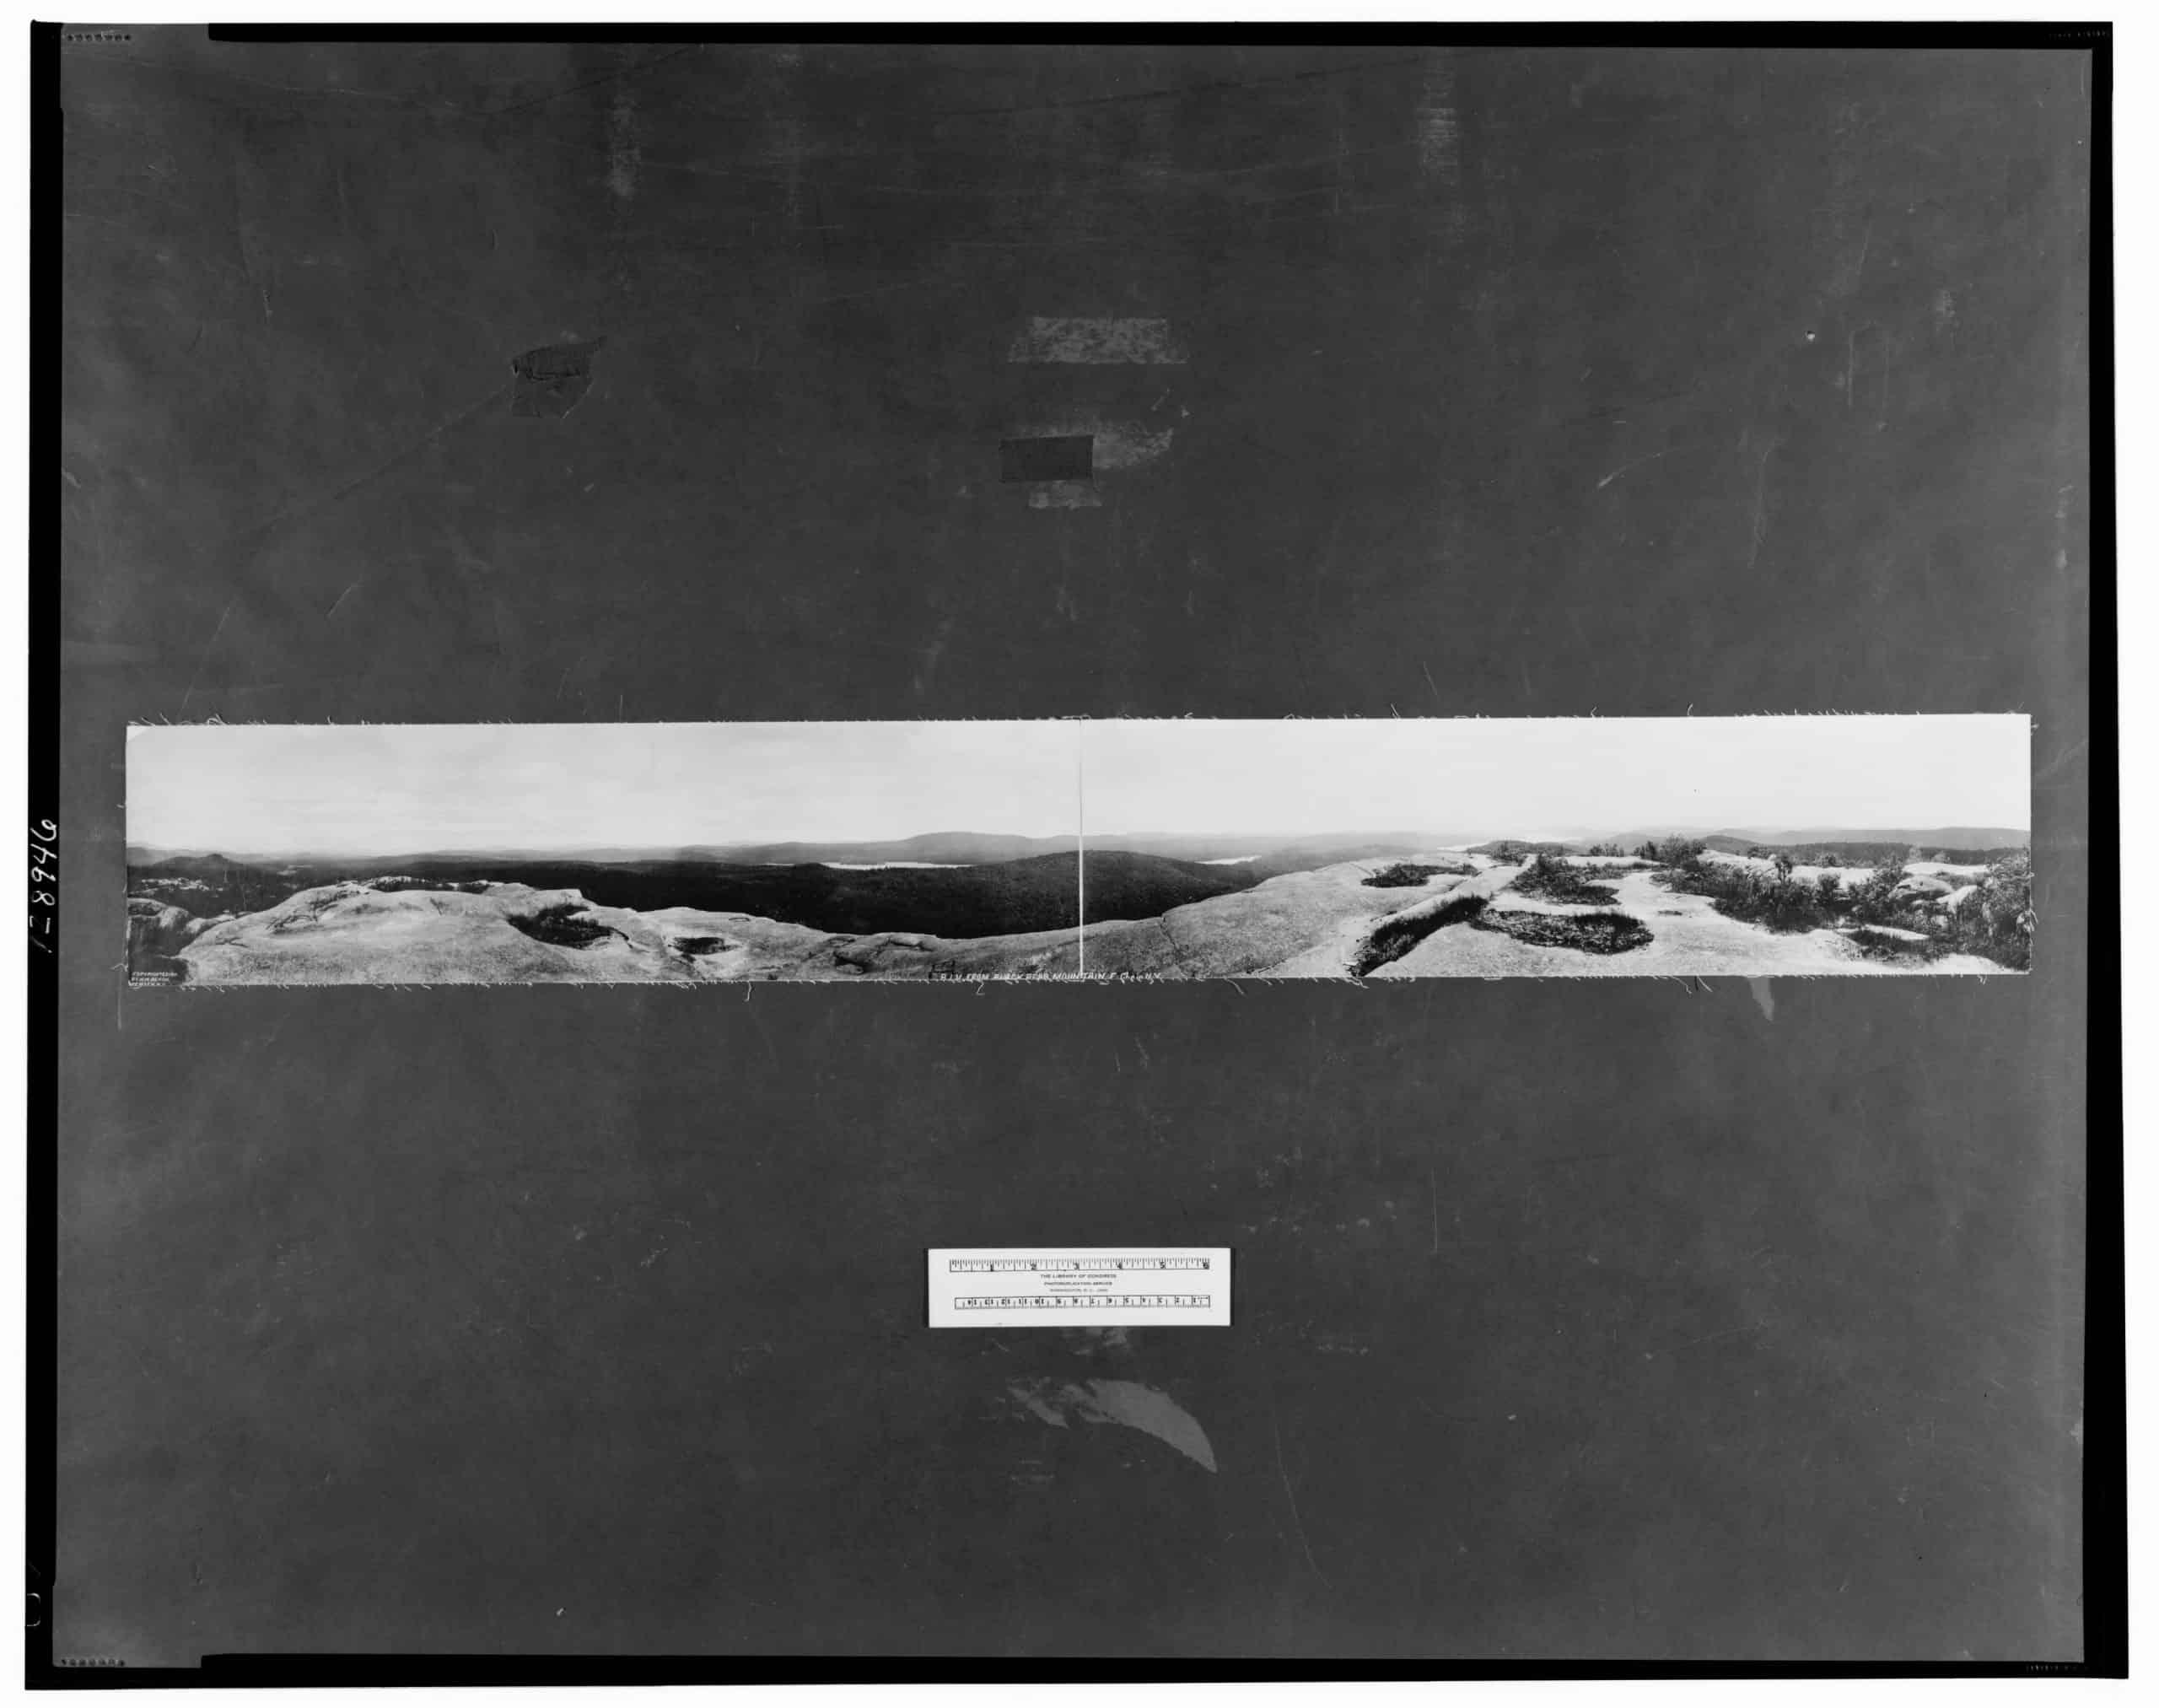 B.I.V. from Black Bear Mountain, F. Chain, N.Y., H. M. Beach, ca 1911